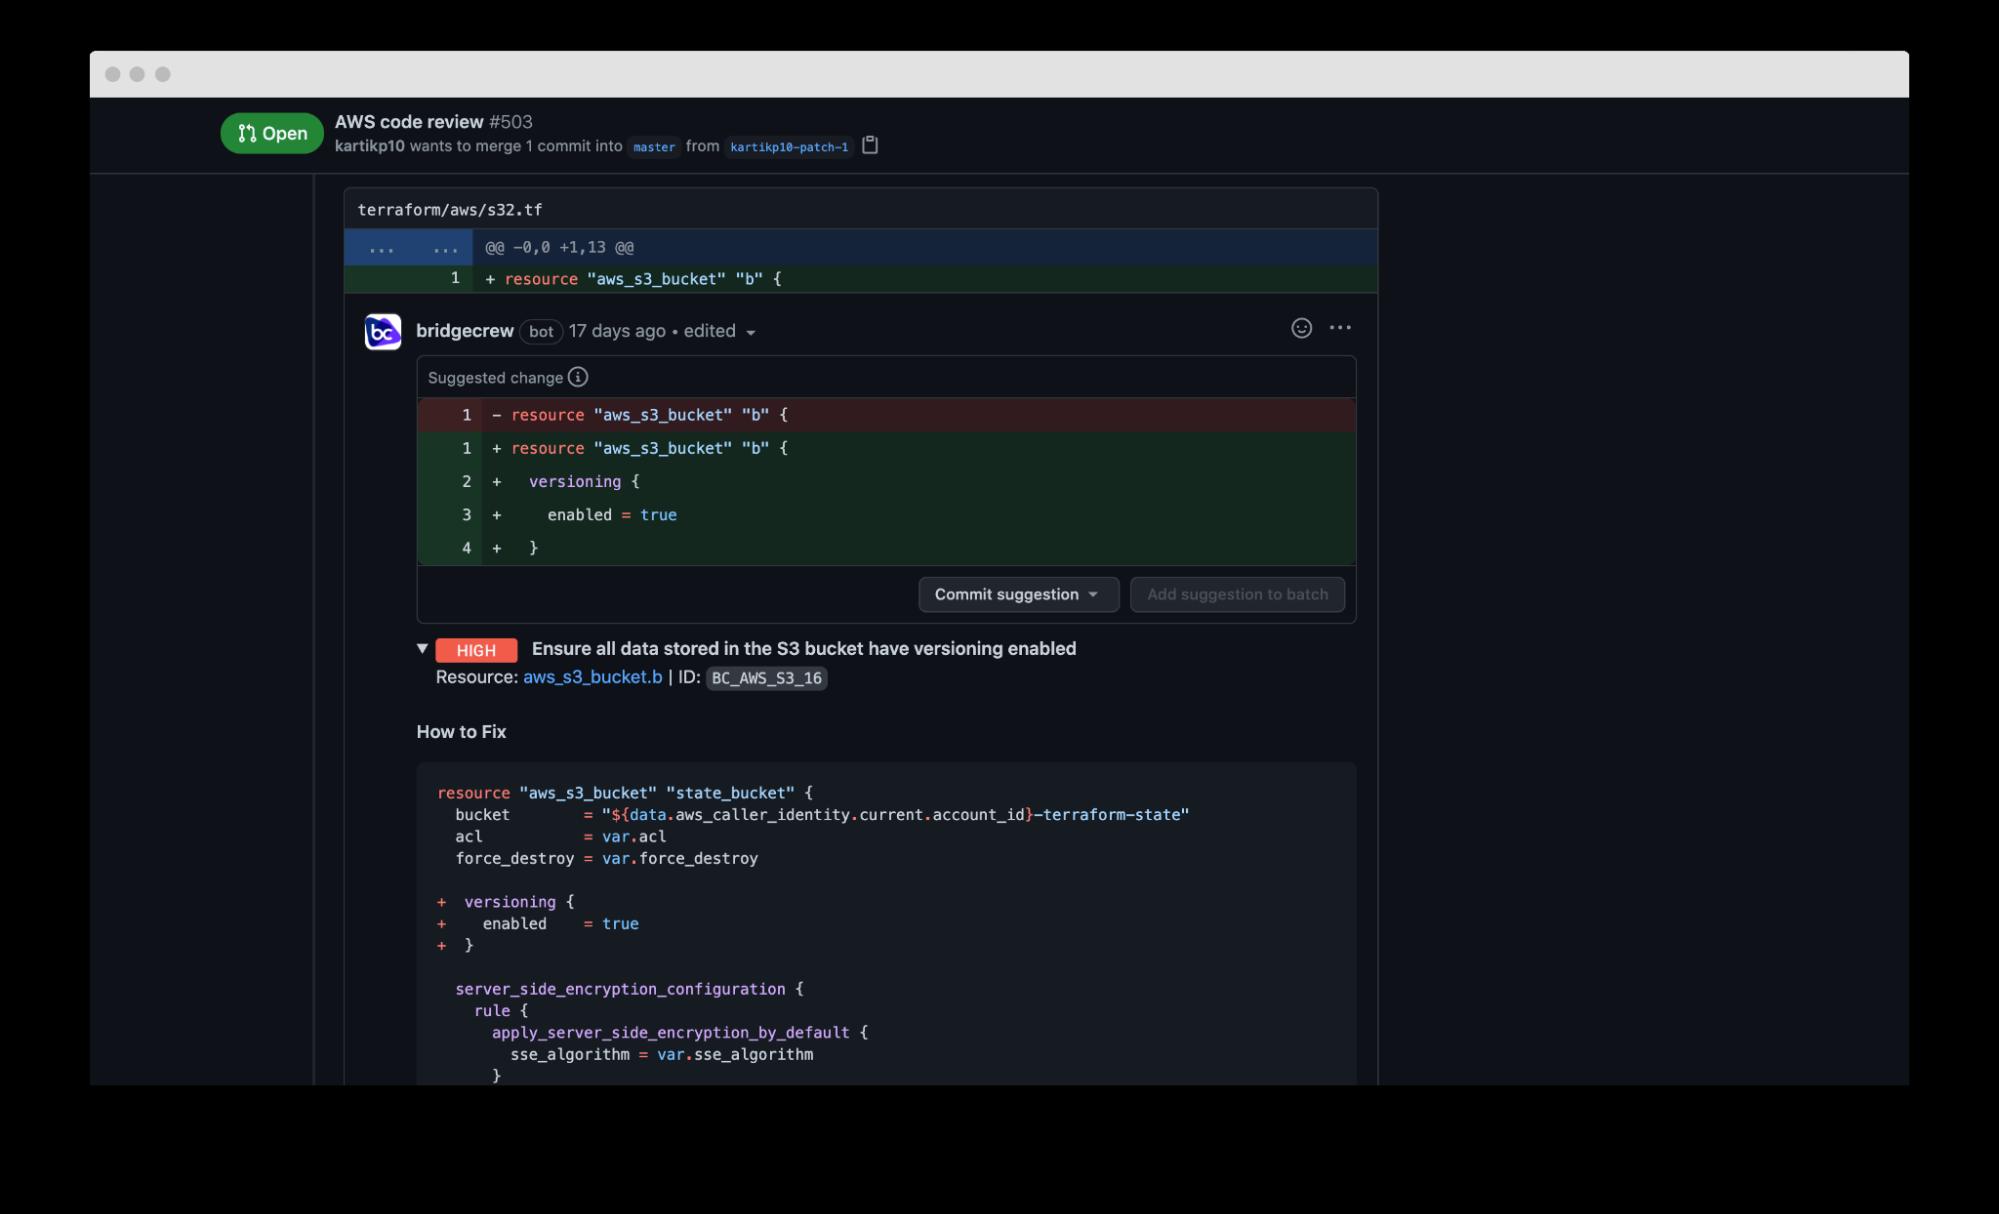 screenshot of aws code review